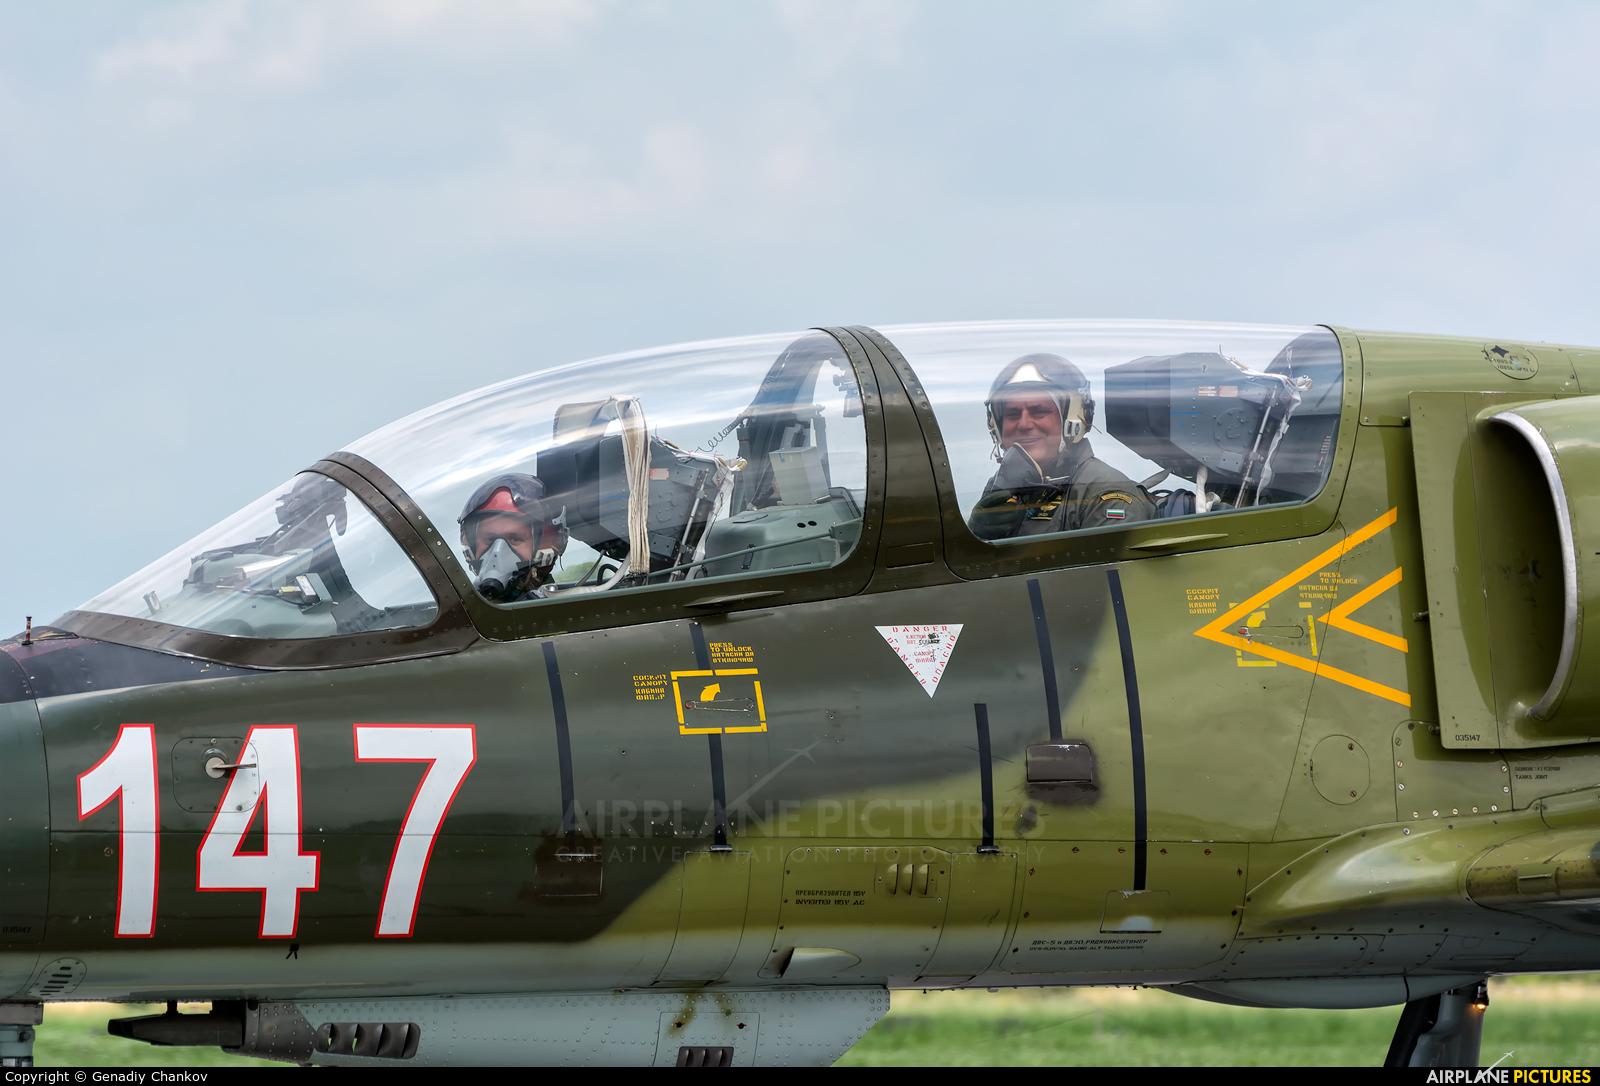 Bulgaria - Air Force 147 aircraft at Graf Ignatievo